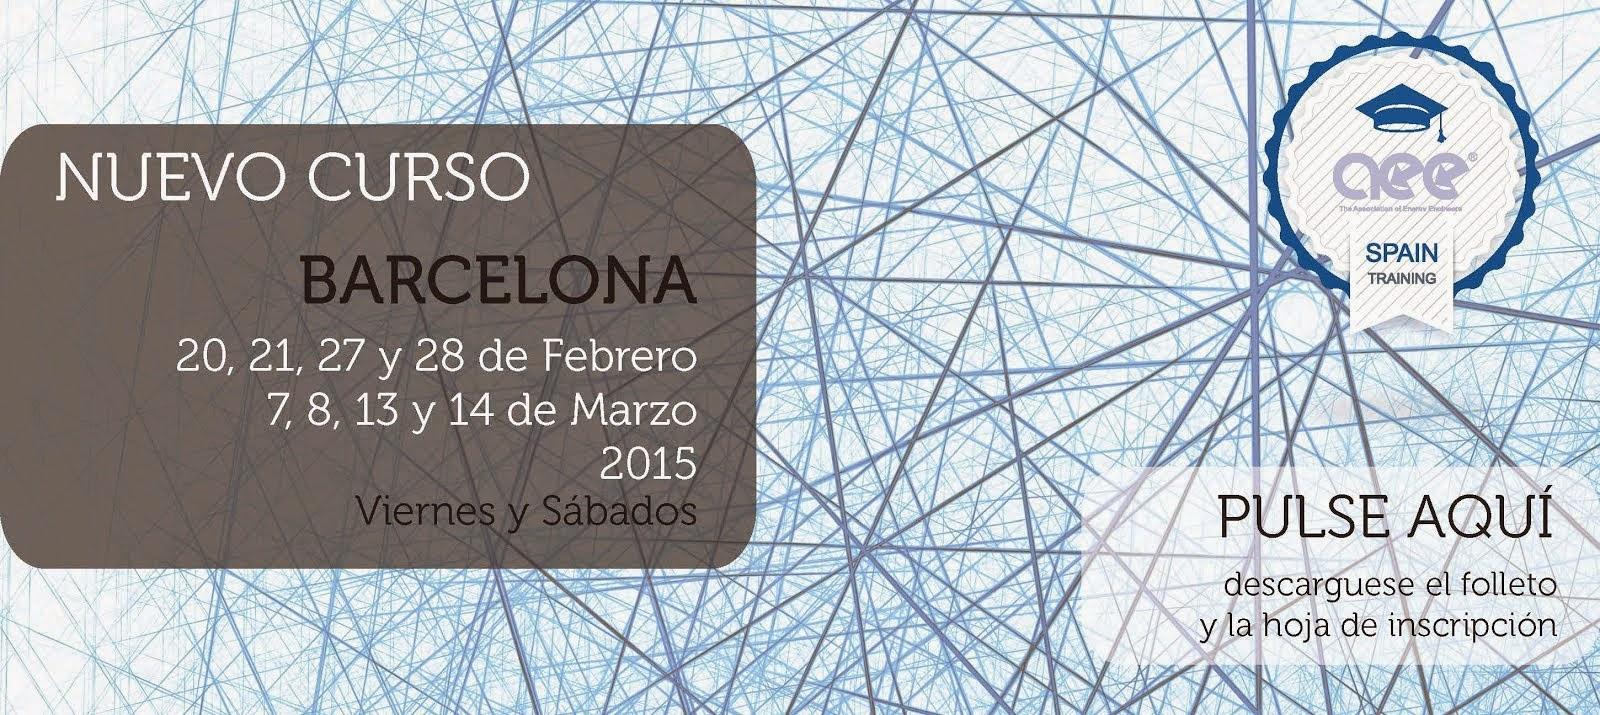 Curso CEM Barcelona Febrero 2015